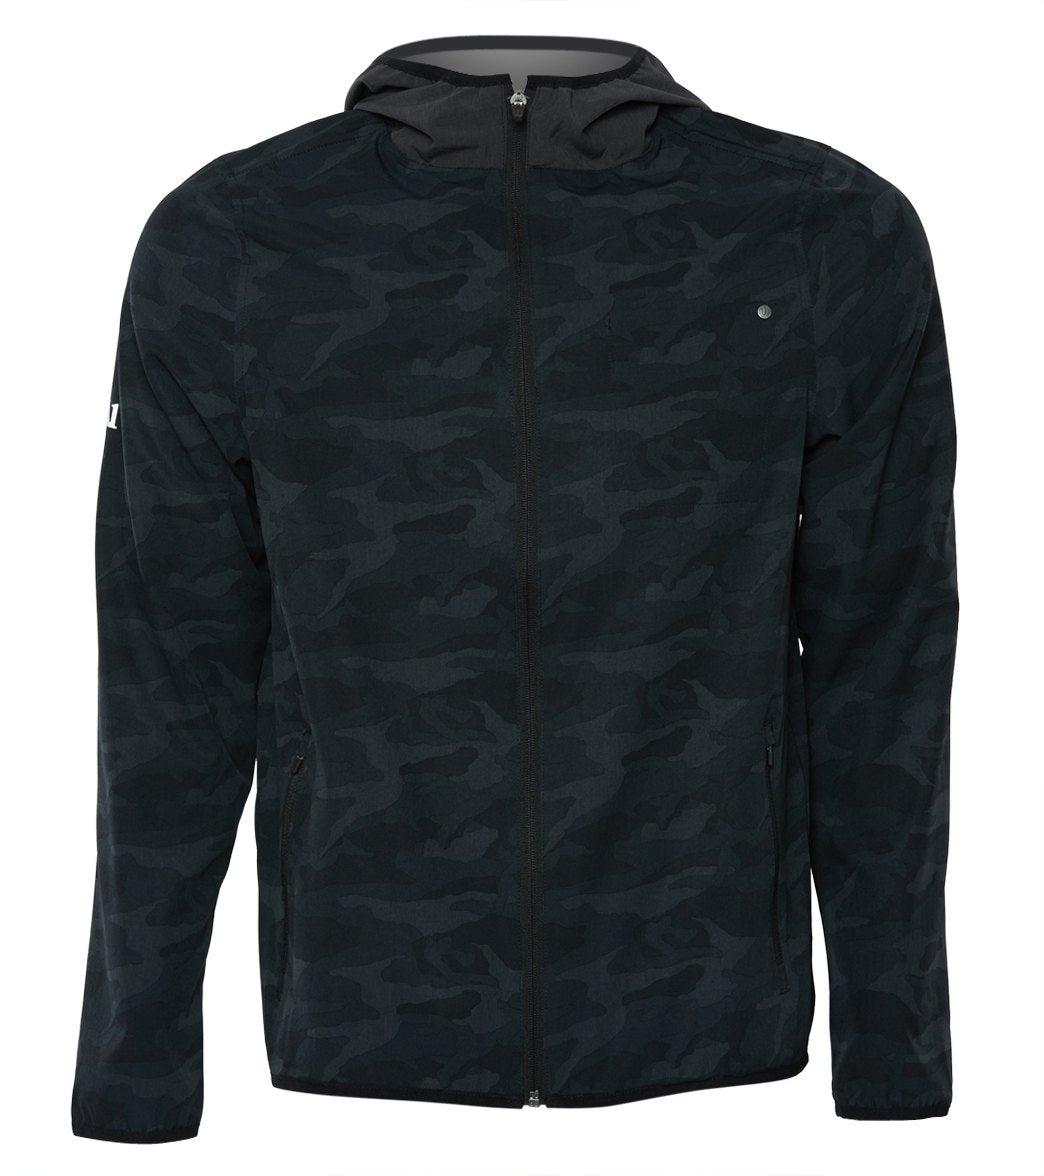 Vuori Men's Outdoor Trainer Shell - Camo Black - Medium Spandex Moisture Wicking